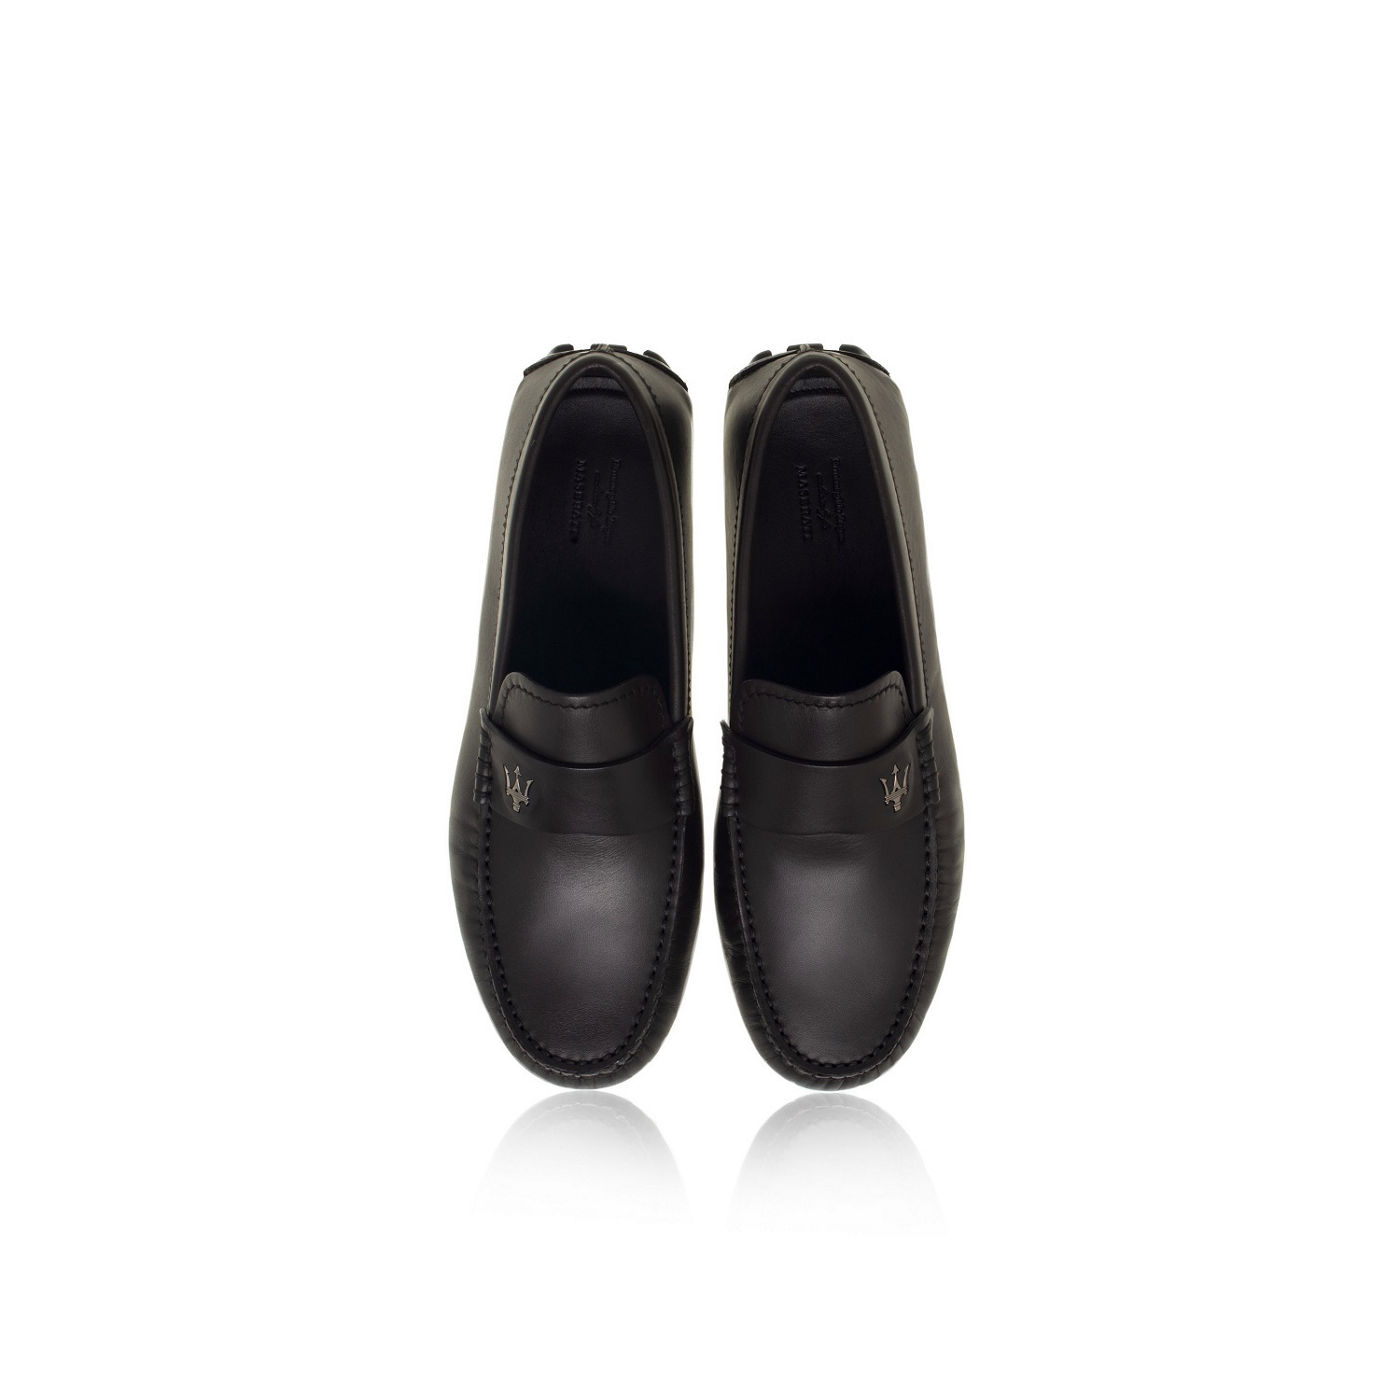 Ermenegildo Zegna pour Maserati chaussures en cuir